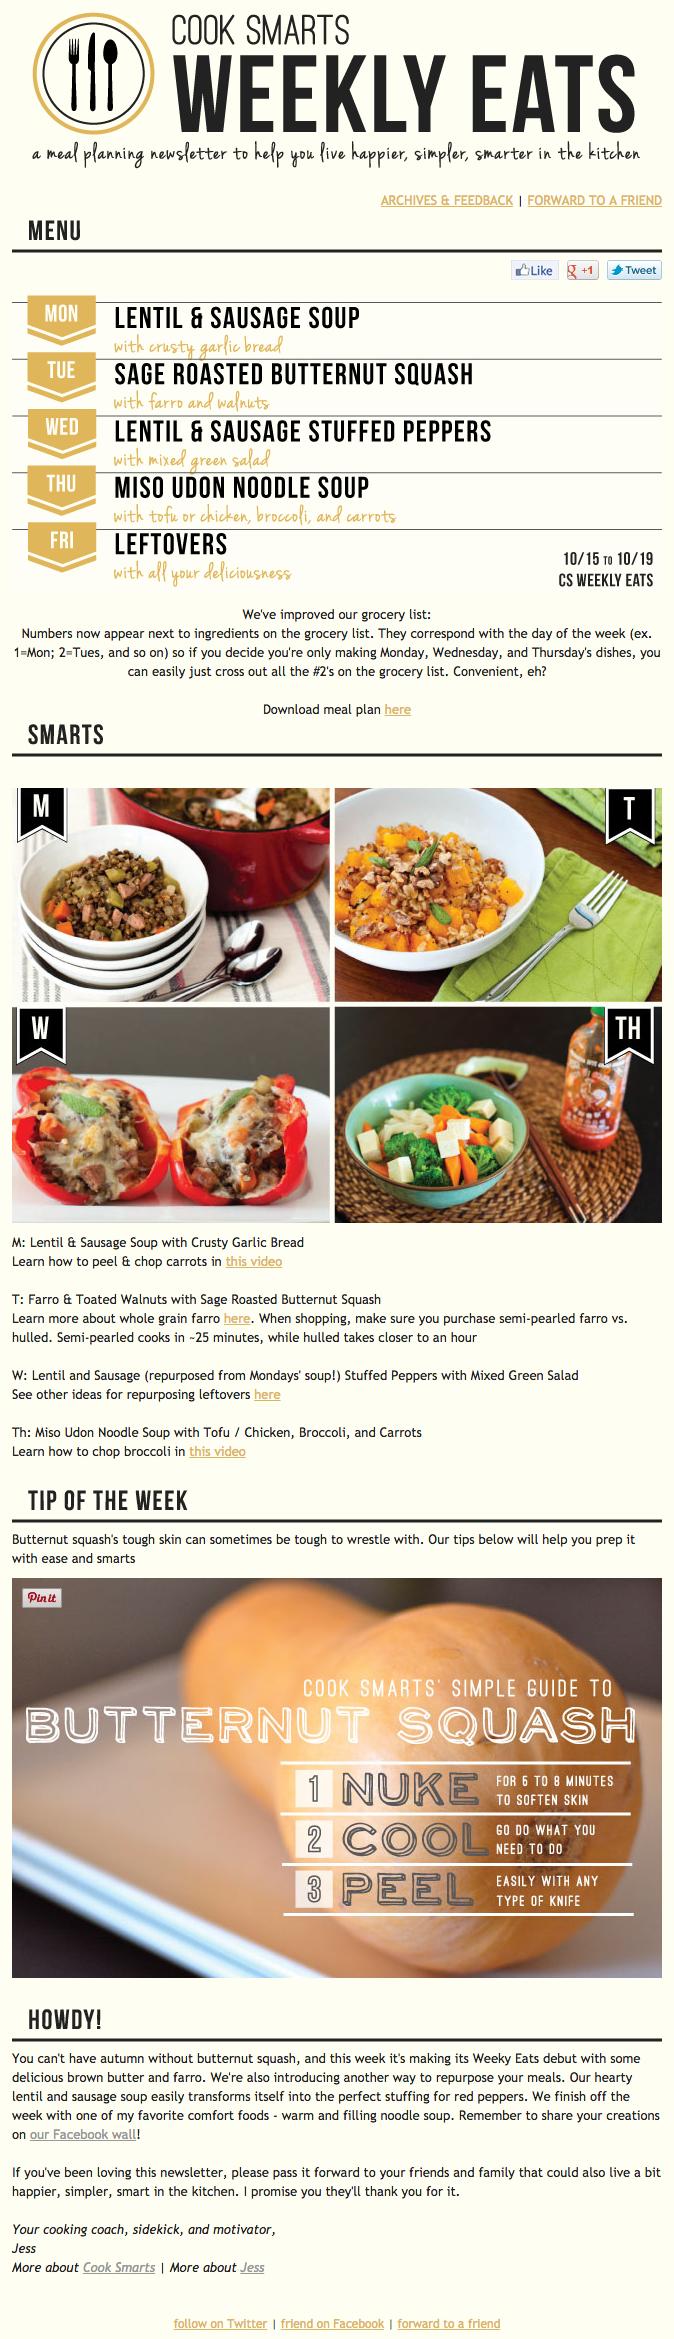 "Esempio di campagna di marketing via email di Cook Smarts su Weekly Eats ""width ="" 669 ""data-constrained ="" true"